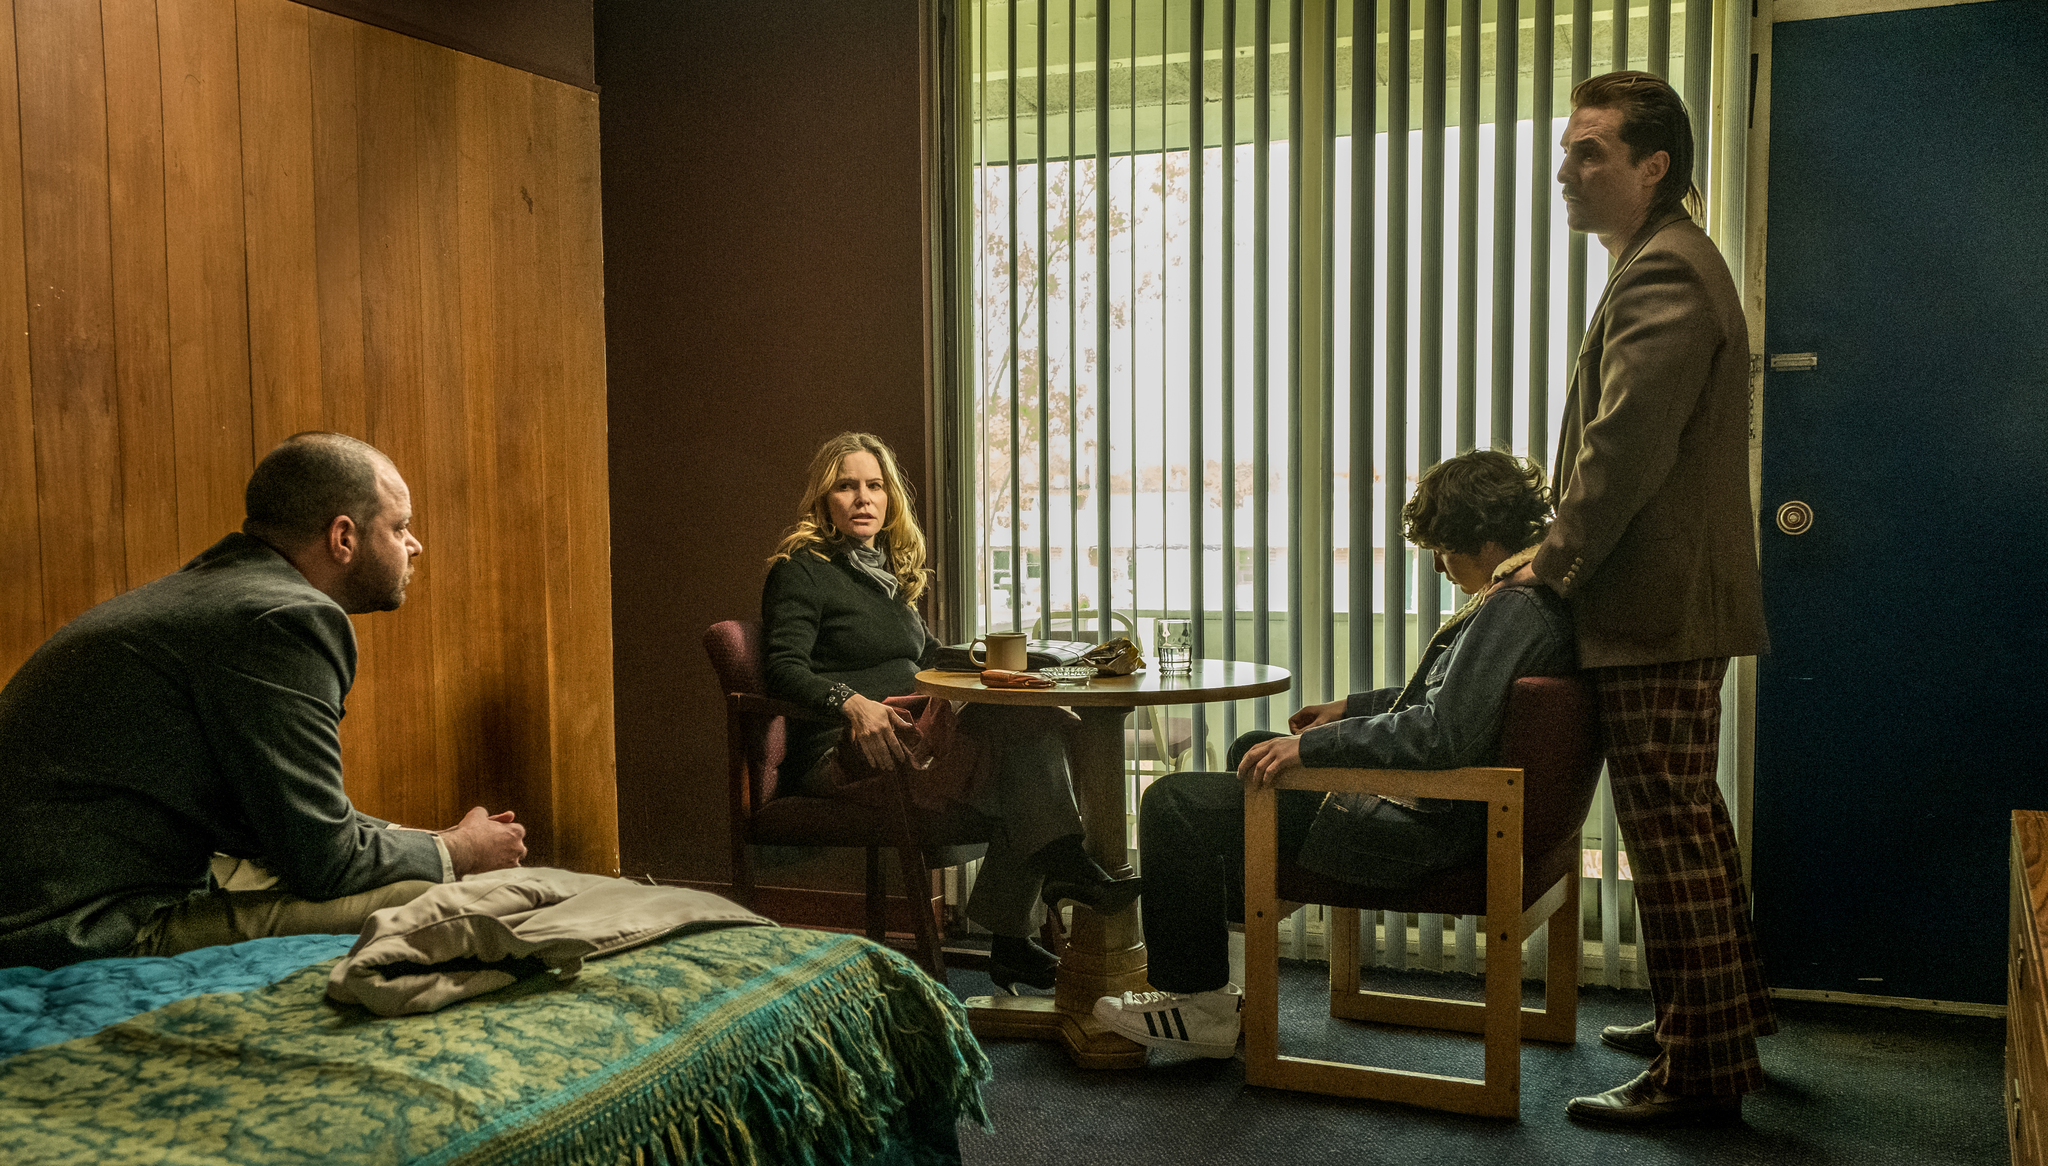 Matthew McConaughey, Jennifer Jason Leigh, Rory Cochrane, and Richie Merritt in White Boy Rick (2018)